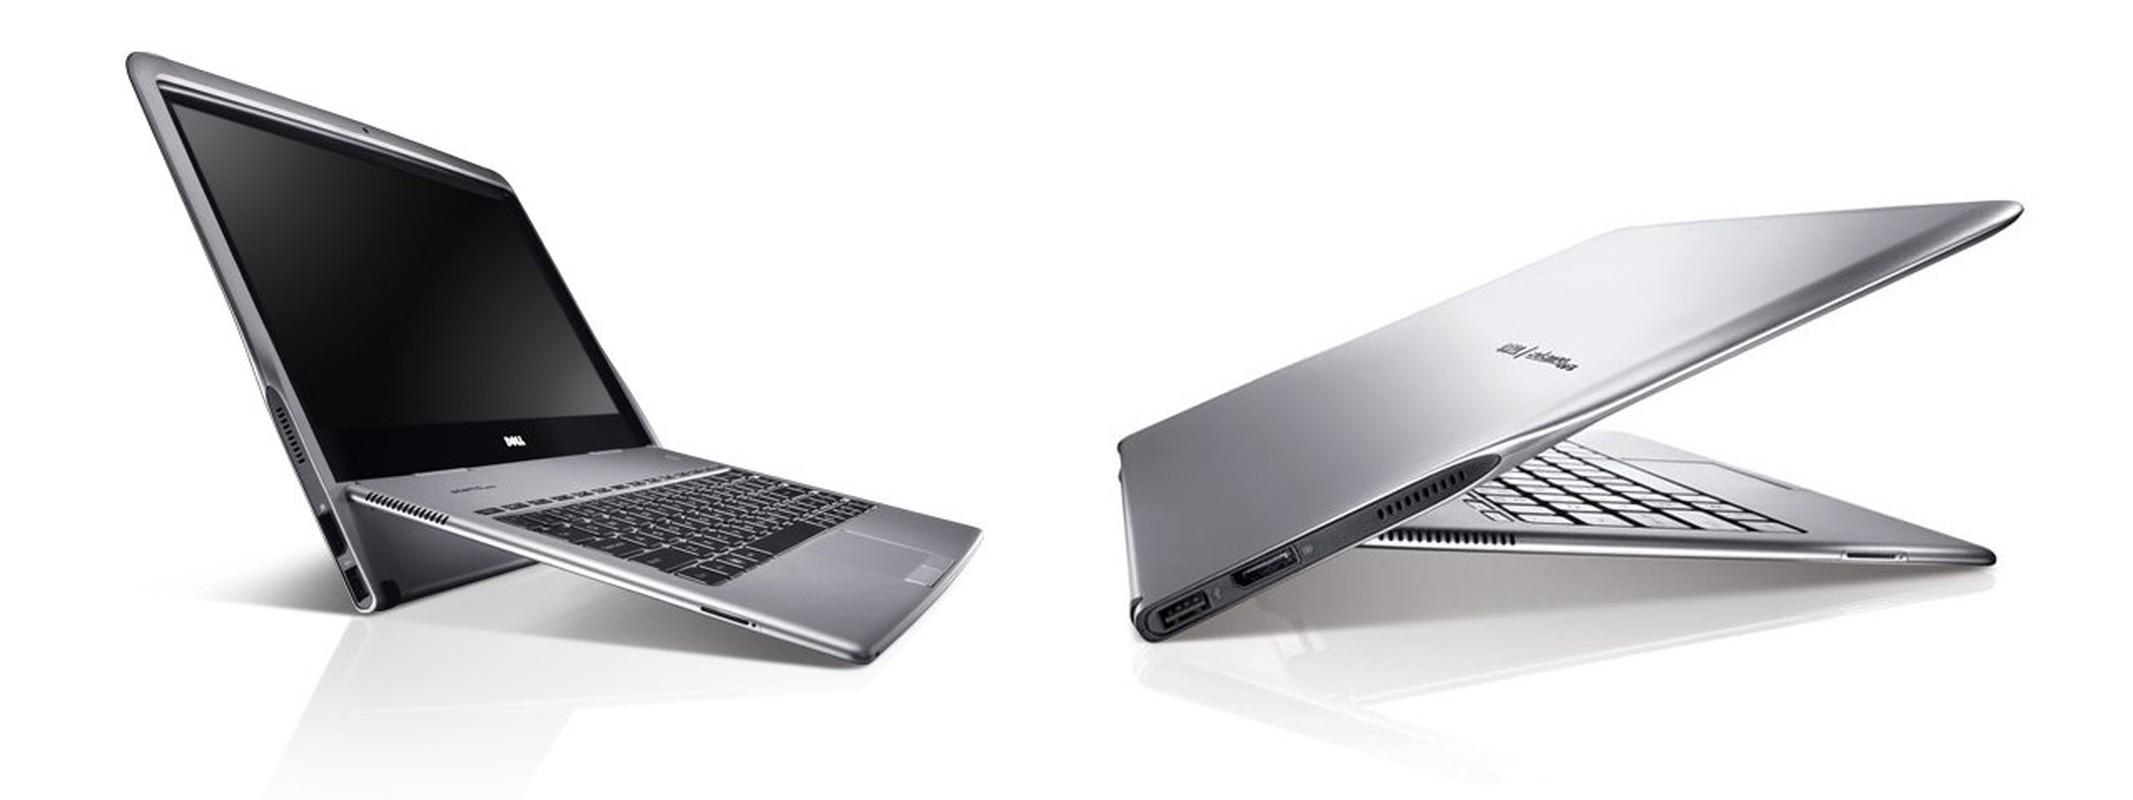 "Nhieu laptop ""co lo si"" nhung co thiet ke di truoc thoi dai-Hinh-6"